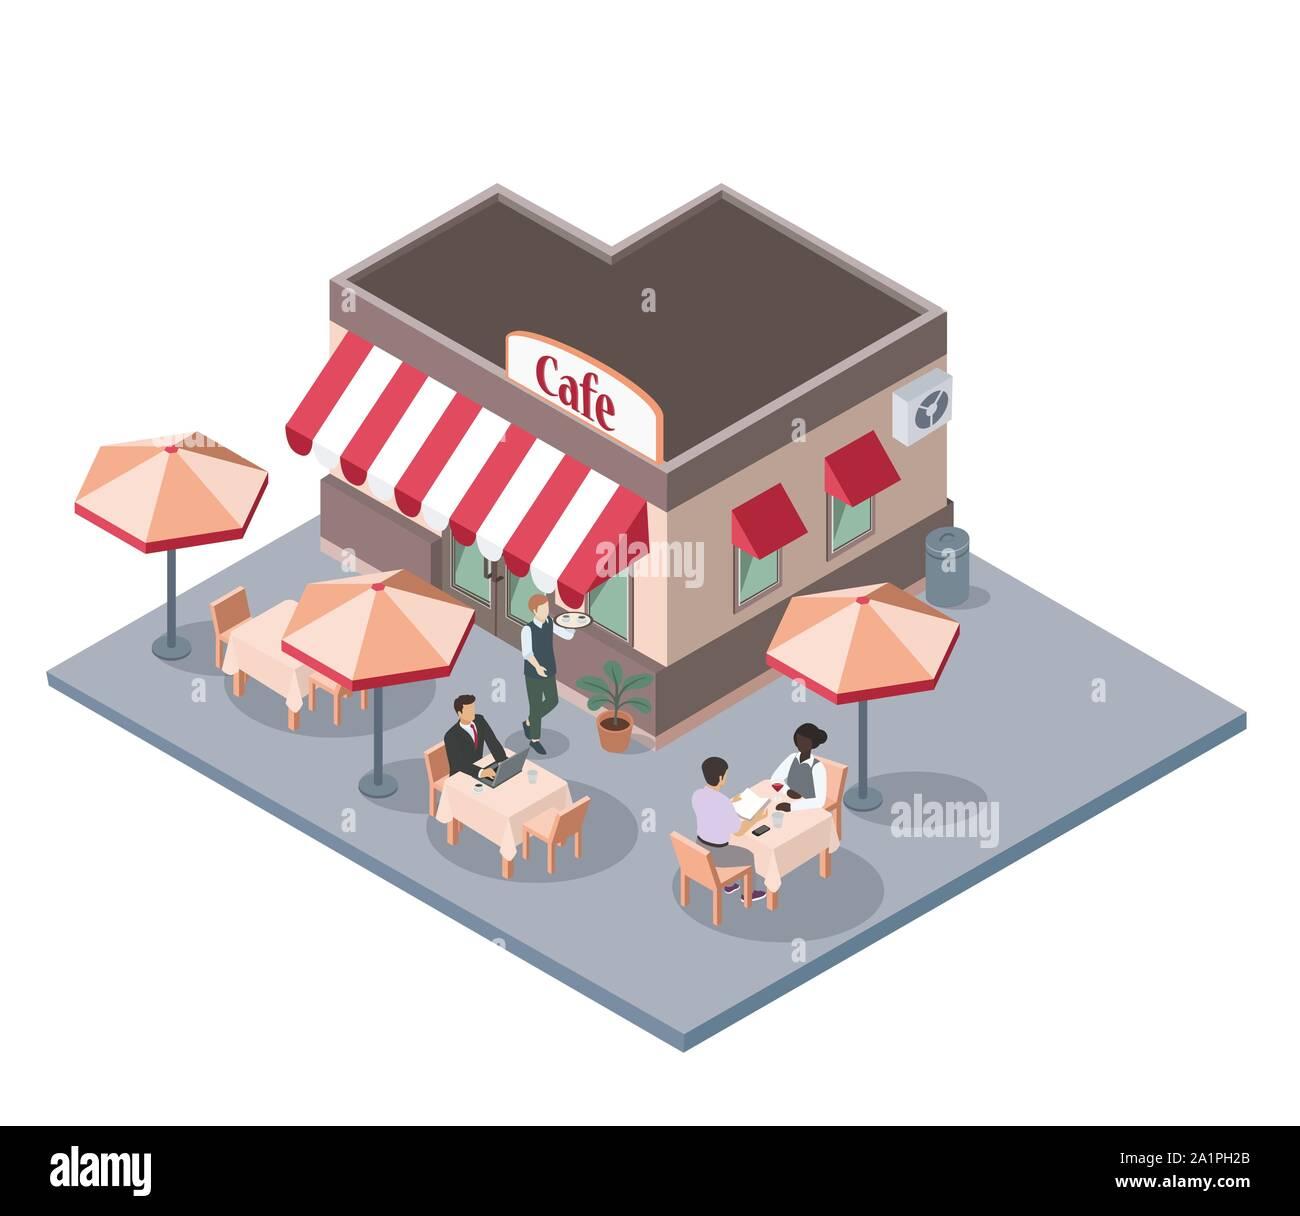 Luft oder Gehweg City Cafe geöffnet, Flachbild Vektor isometrische Stock Vektor